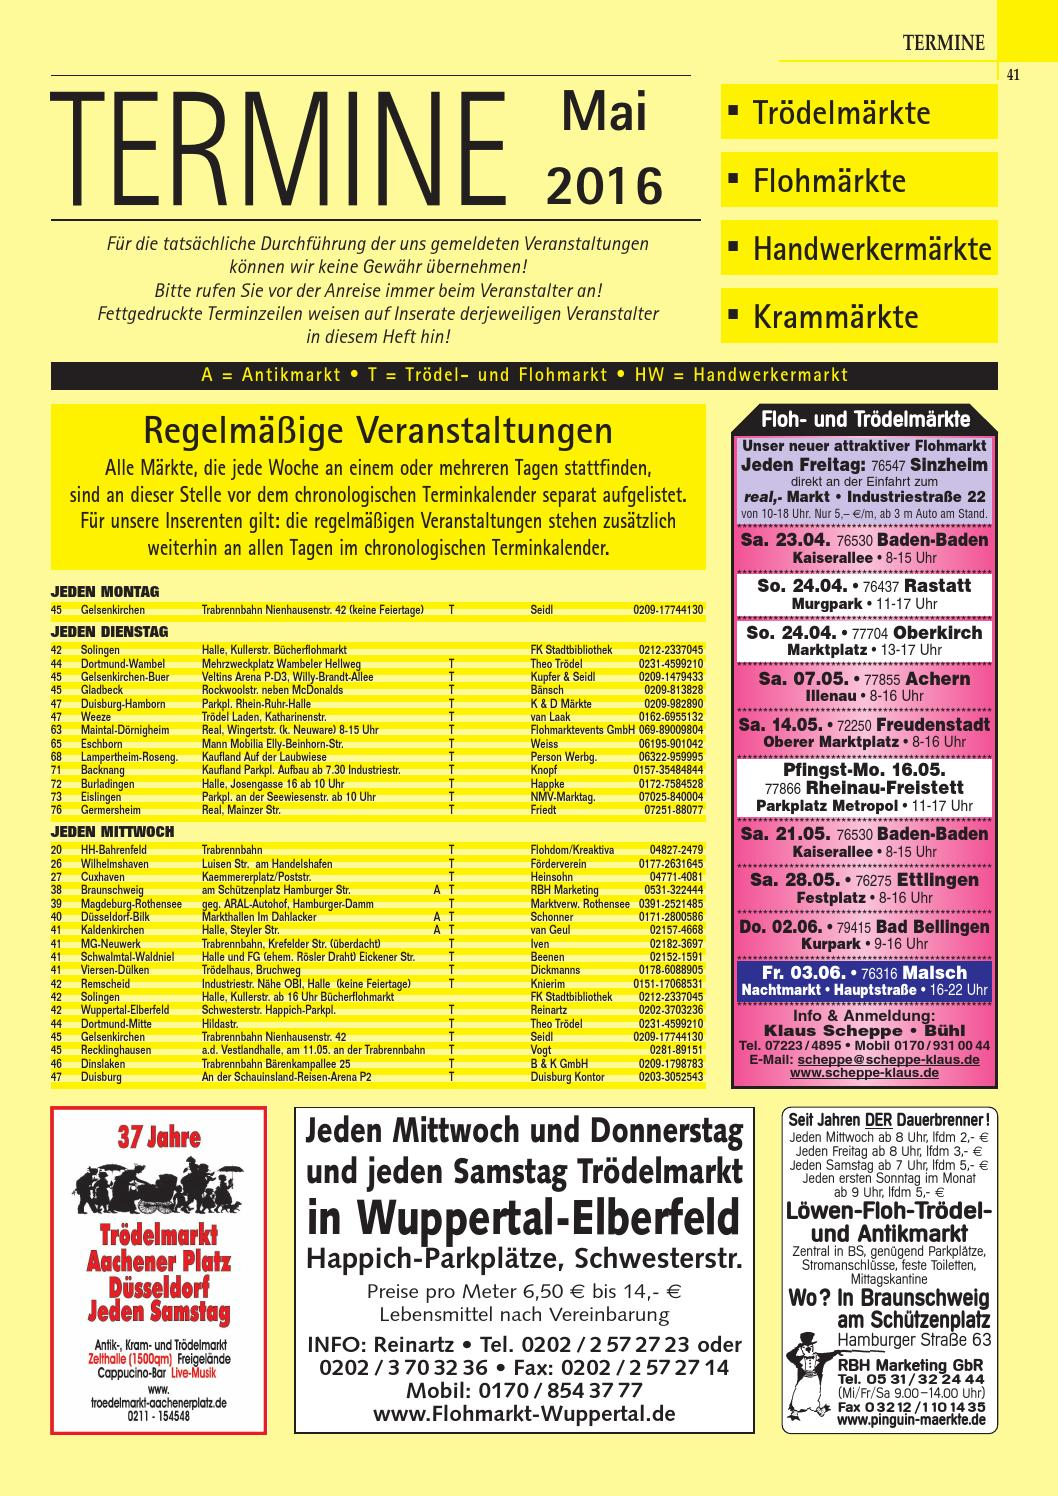 Termine Troedelmaerkte 0516 By Gemi Verlags Gmbh Issuu